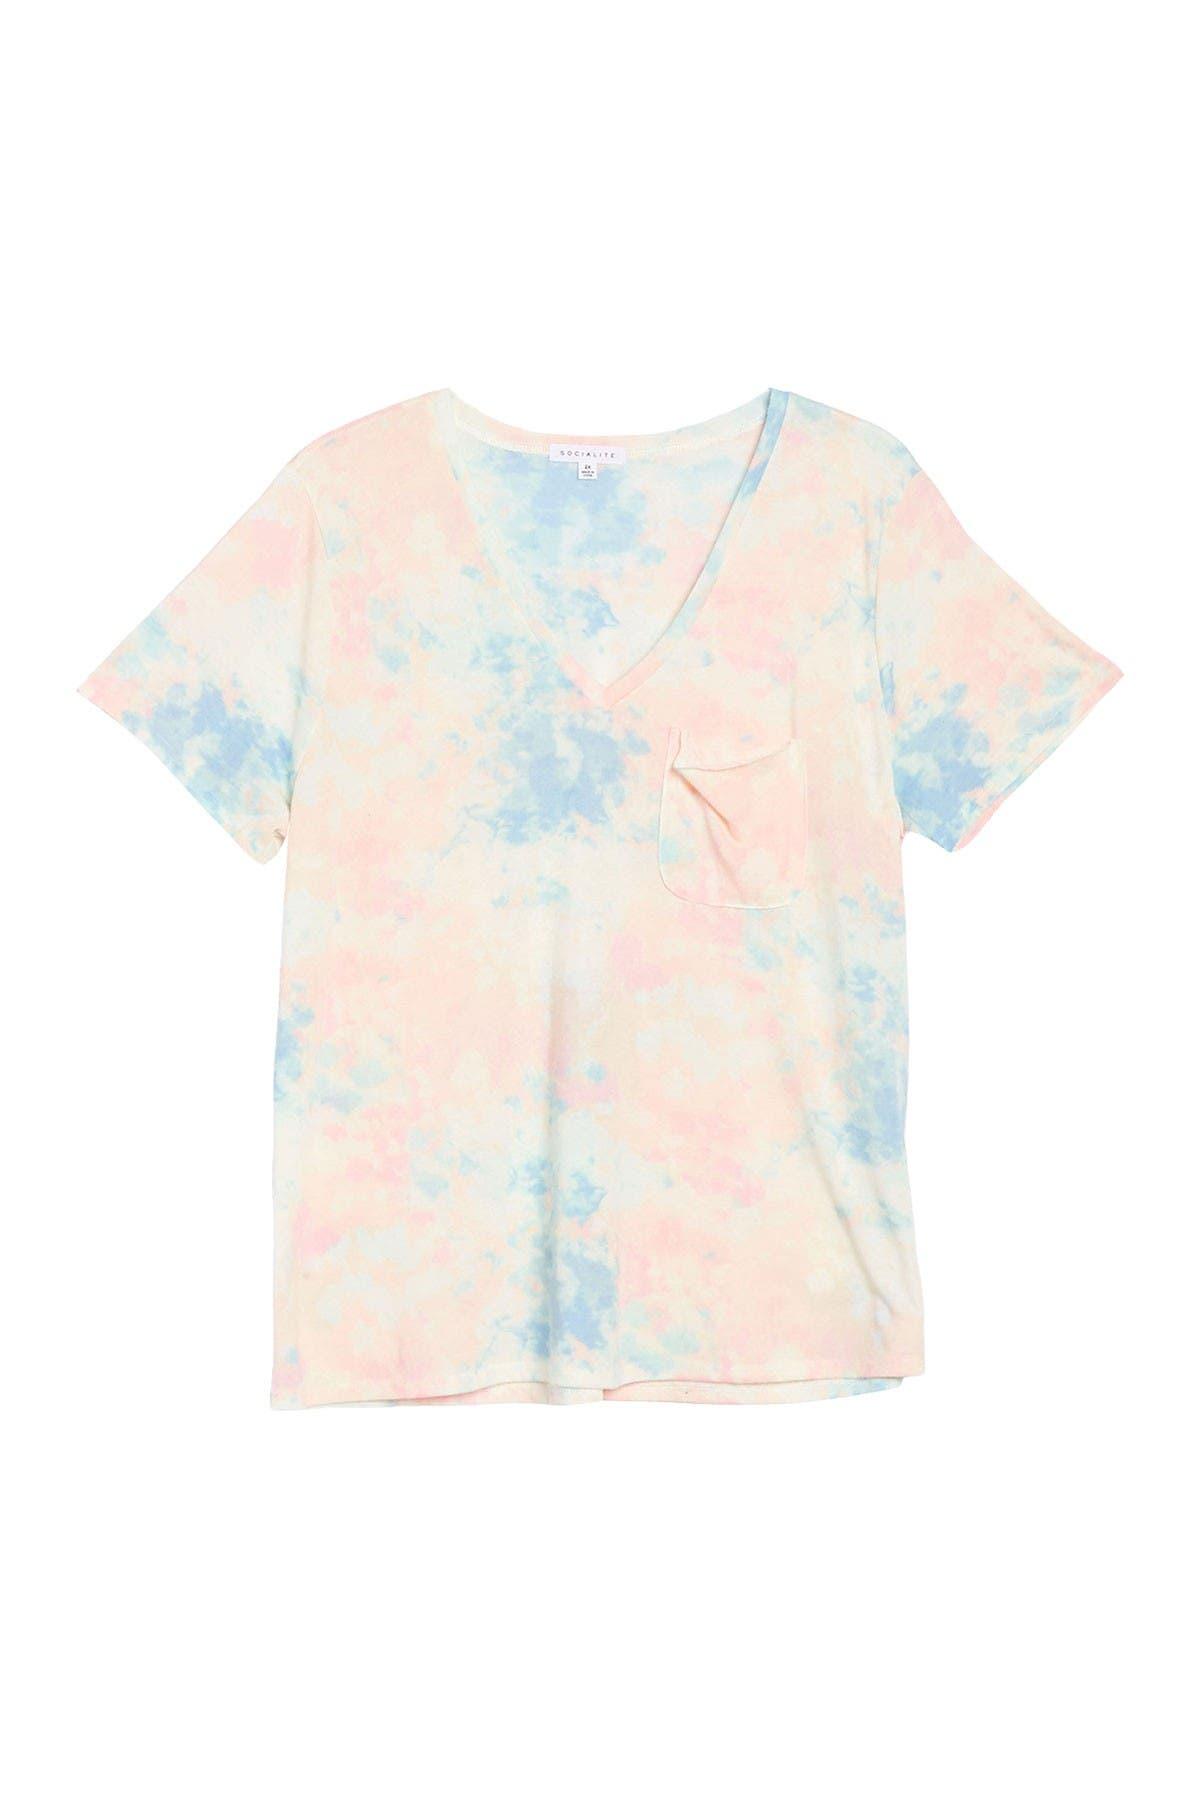 Image of Socialite V-Neck Pocket T-Shirt